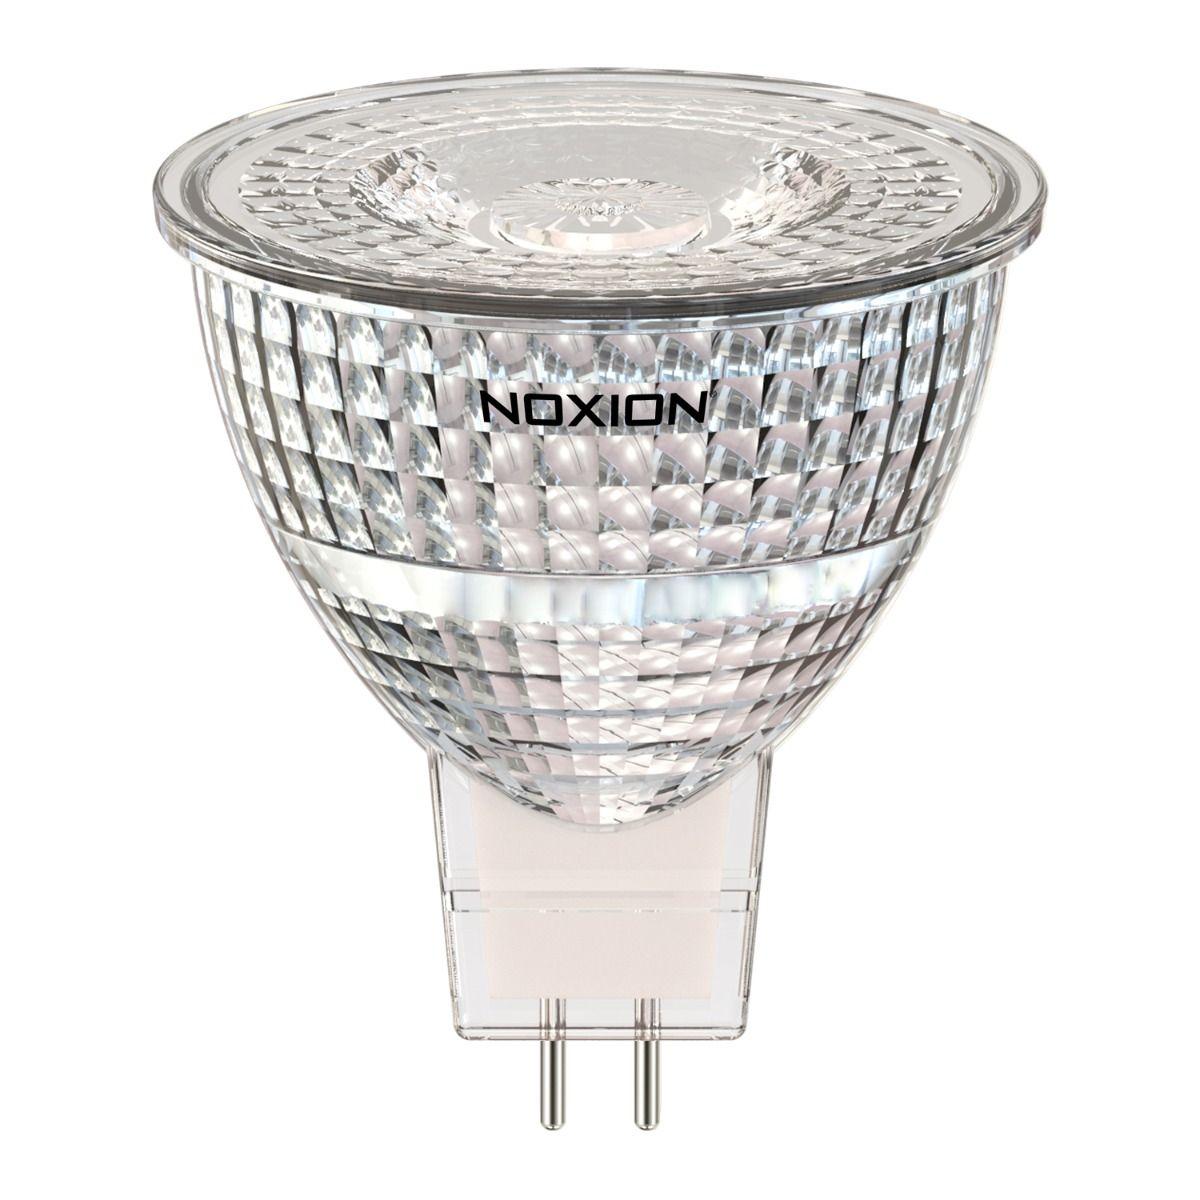 Noxion LED Spot GU5.3 7.8W 840 36D 730lm | Replacer for 50W